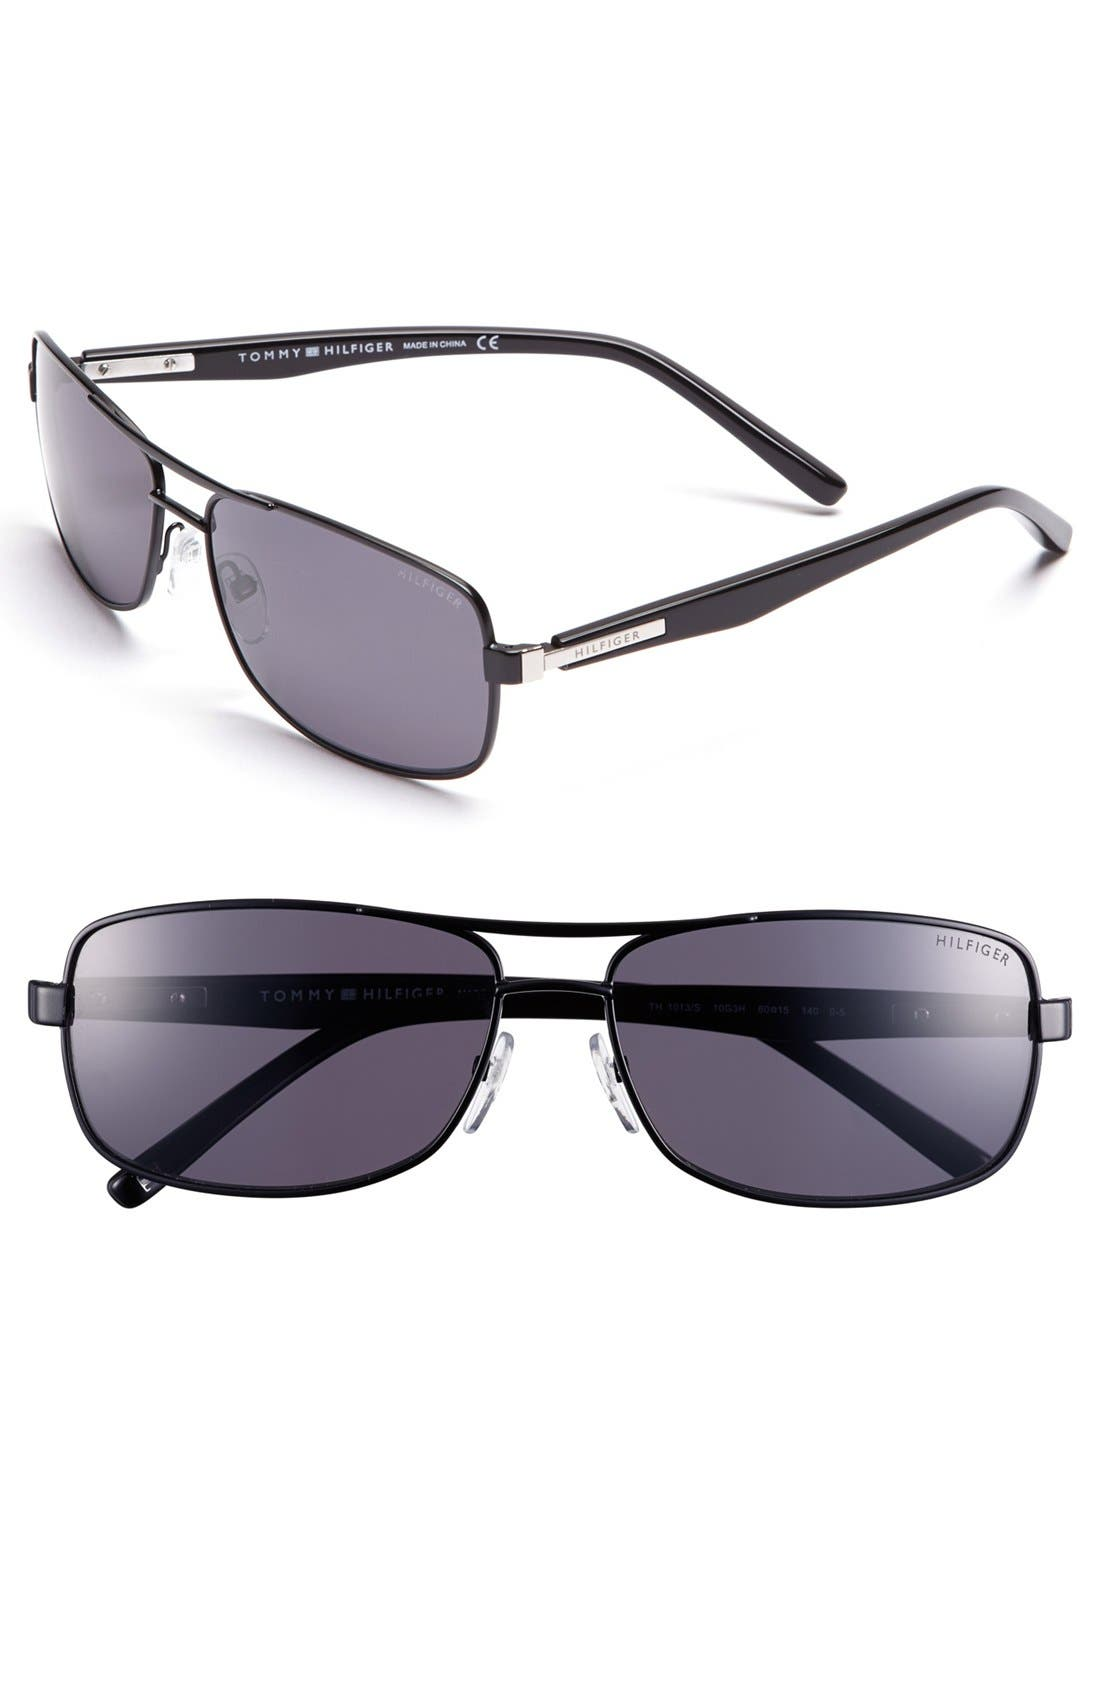 Main Image - Tommy Hilfiger 60mm Polarized Navigator Sunglasses